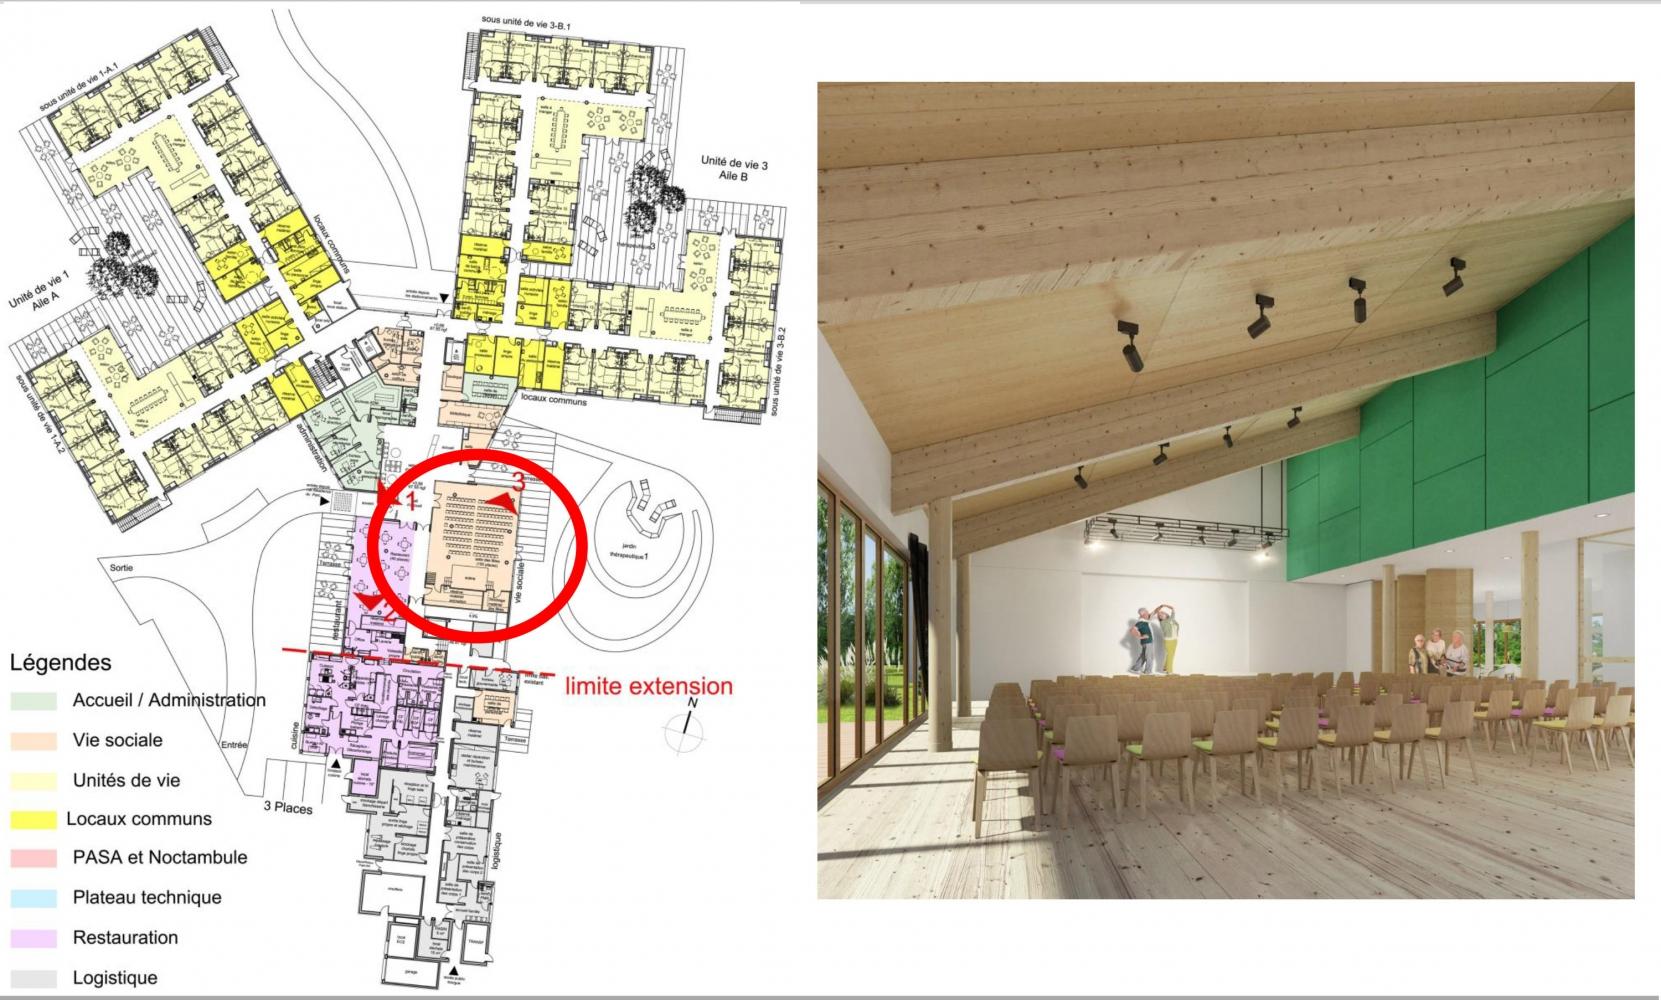 01-st-germain-img-009 Pascale SEURIN Architecte - Médico-Social